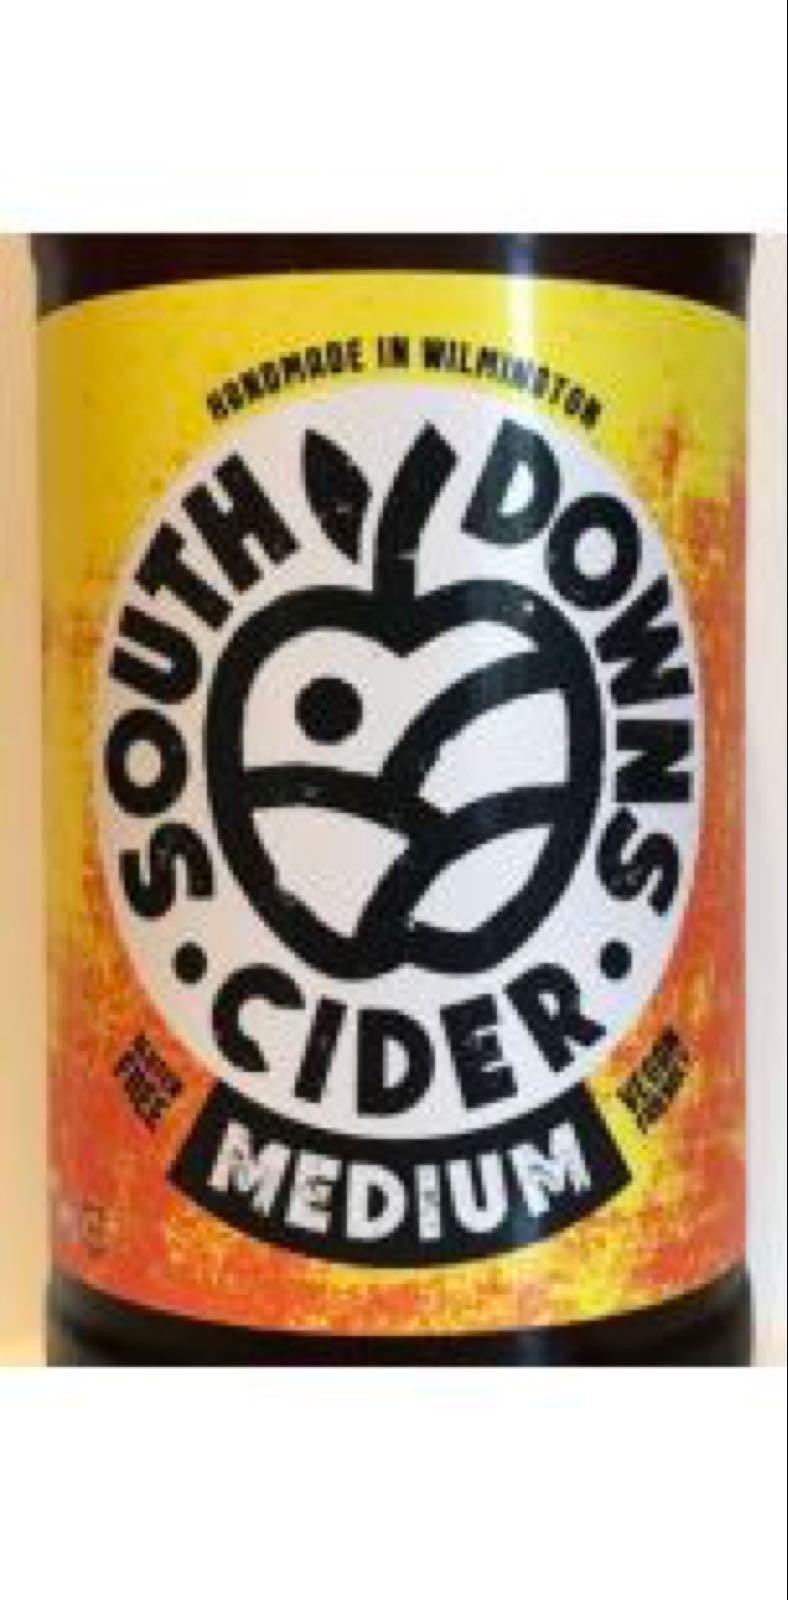 South Downs Medium